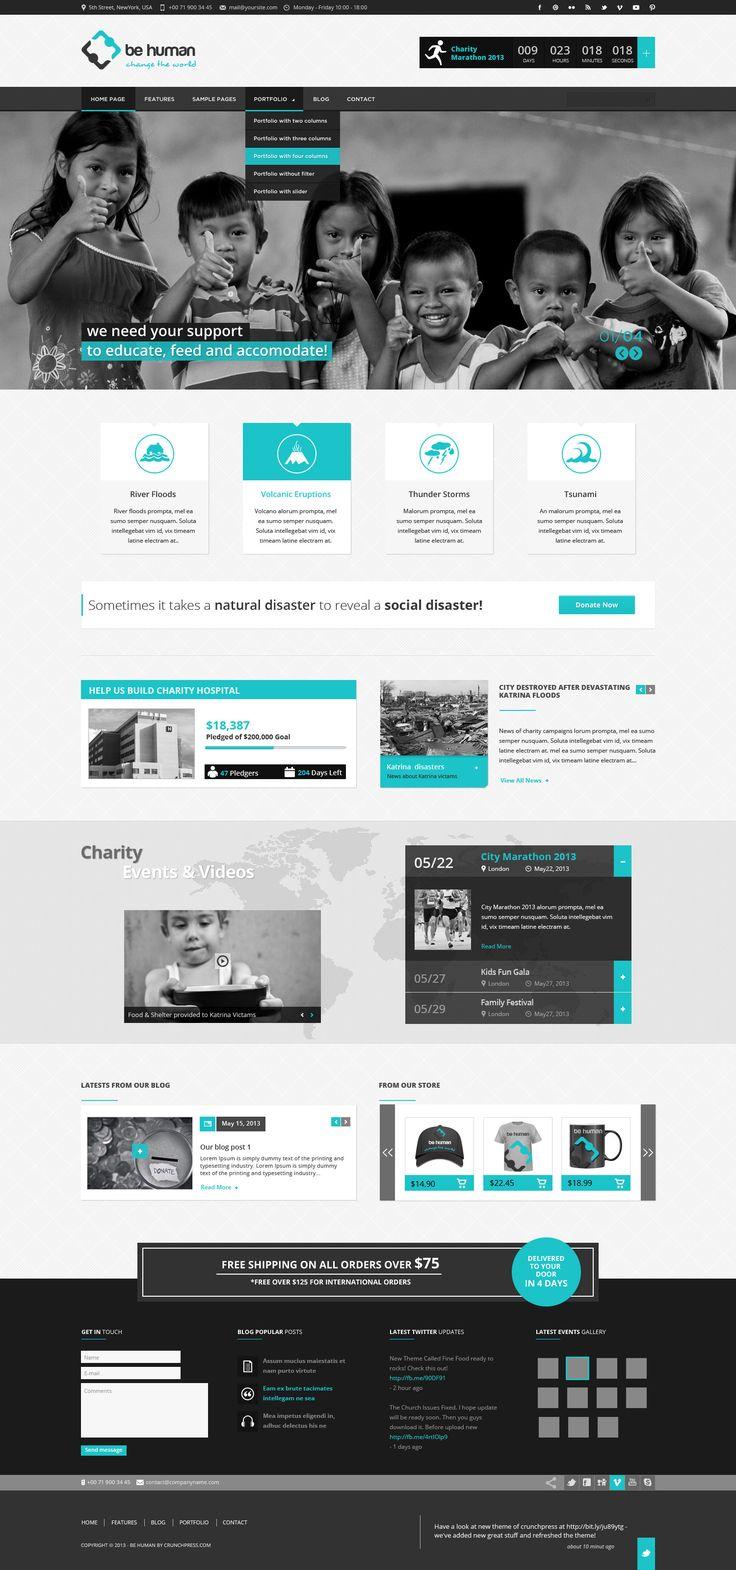 Be Human - Charity Multipurpose WP Retina Theme http://themeforest.net/item/be-human-charity-multipurpose-wp-retina-theme/5326773?ref=wpaw #web #design #website